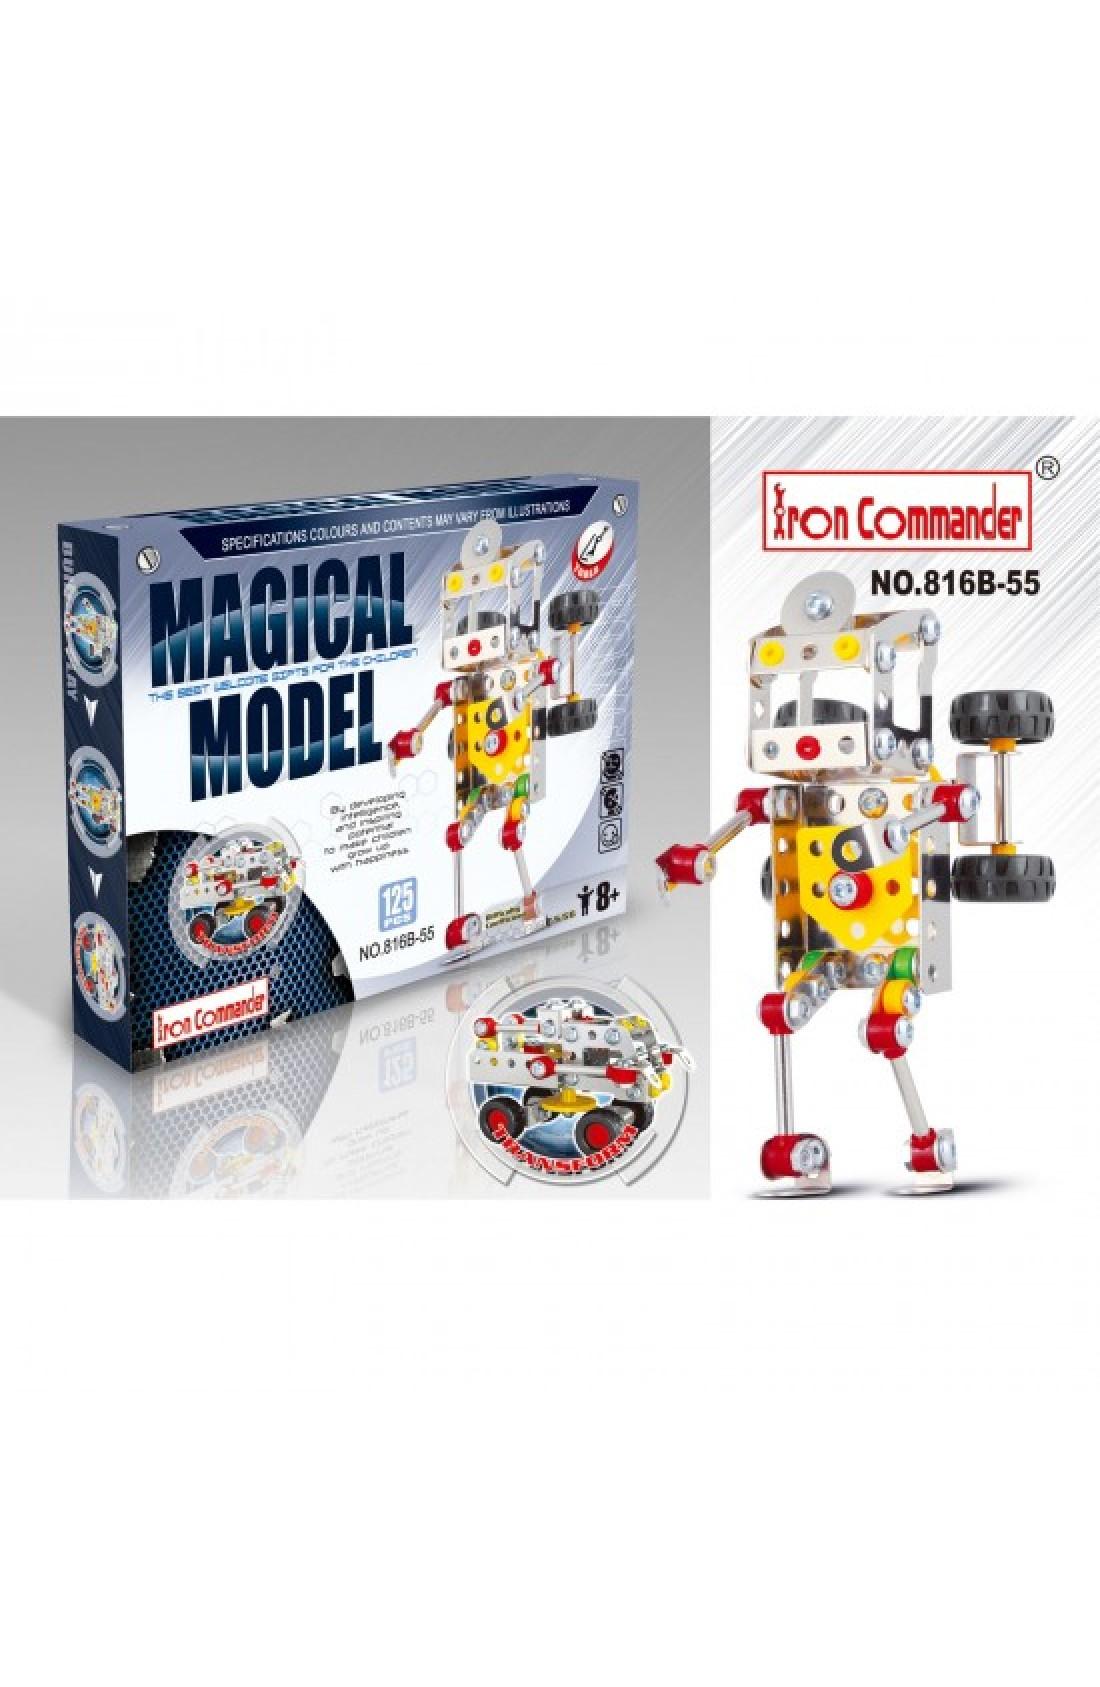 Iron Commander Meccano Style DIY Metal Robot- Model 816B-55